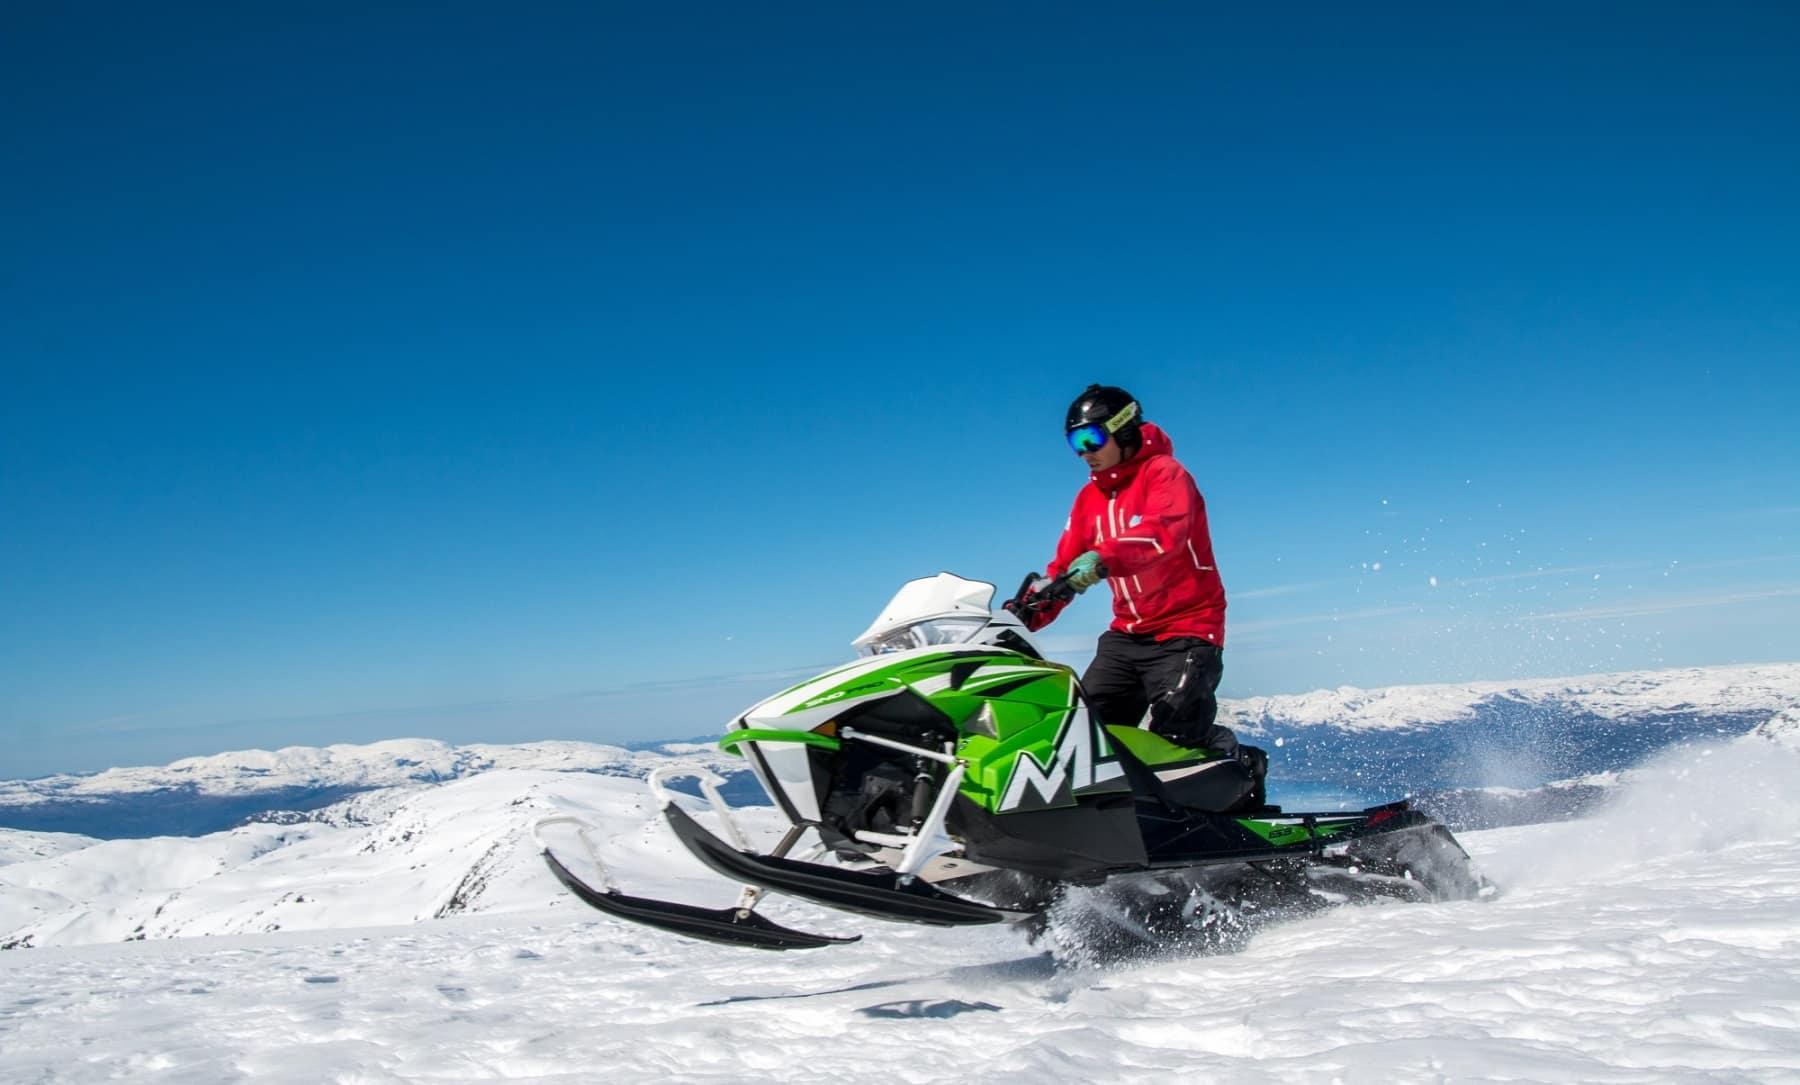 riding a snowmobile